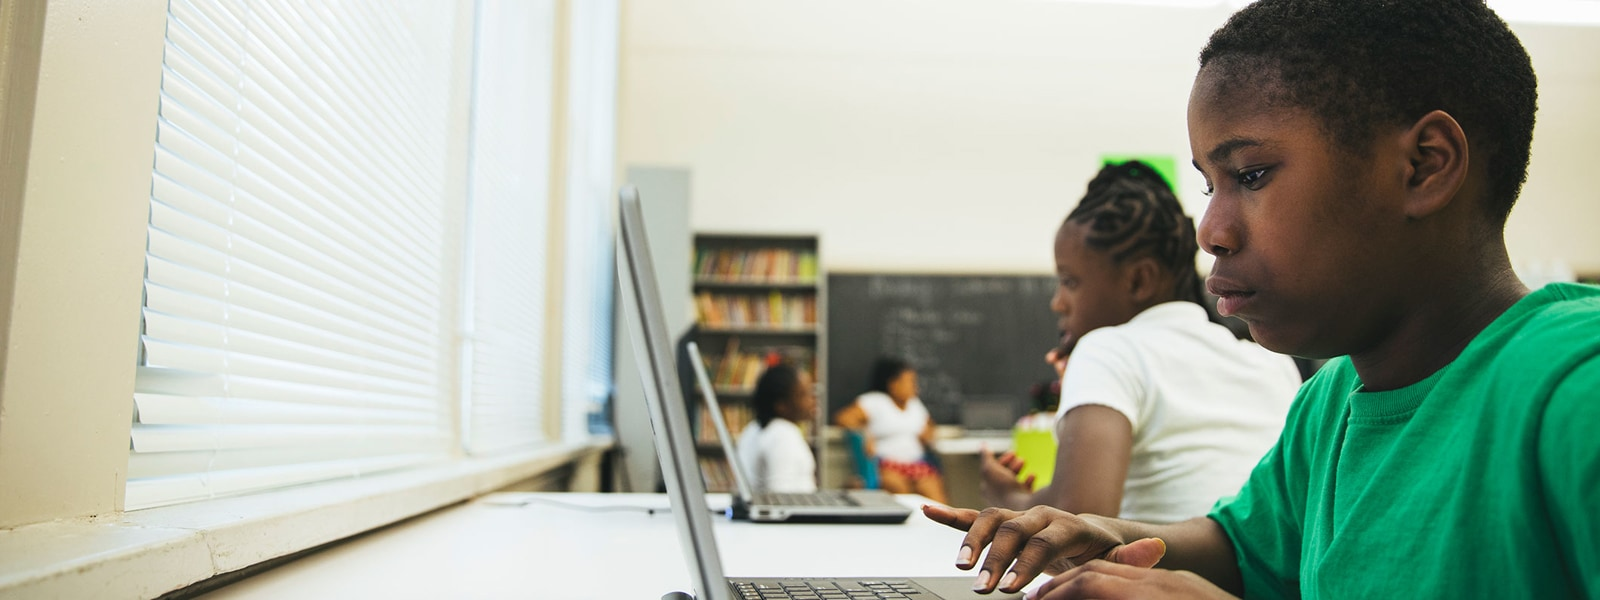 Students learning digital skills